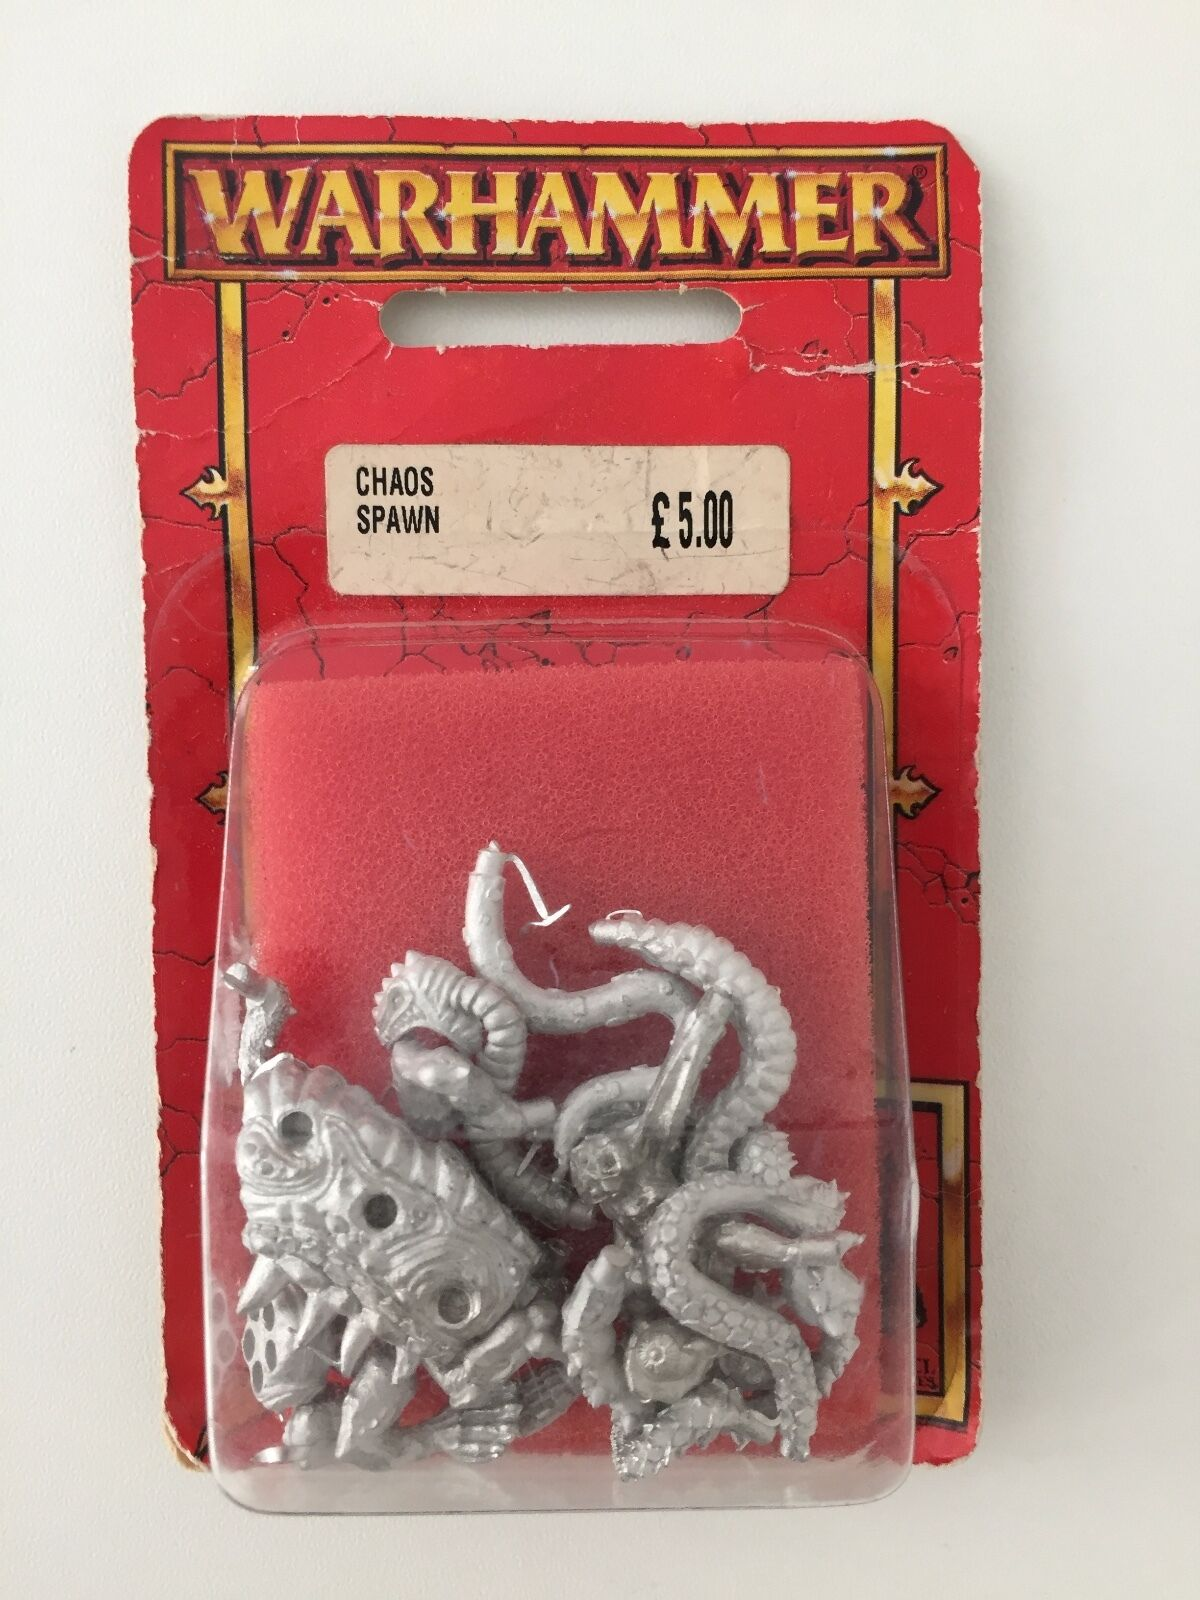 WARHAMMER CHAOS SPAWN NURGLE SLAANESH KHORNE TZEENTCH METAL BLISTER (RED 573)